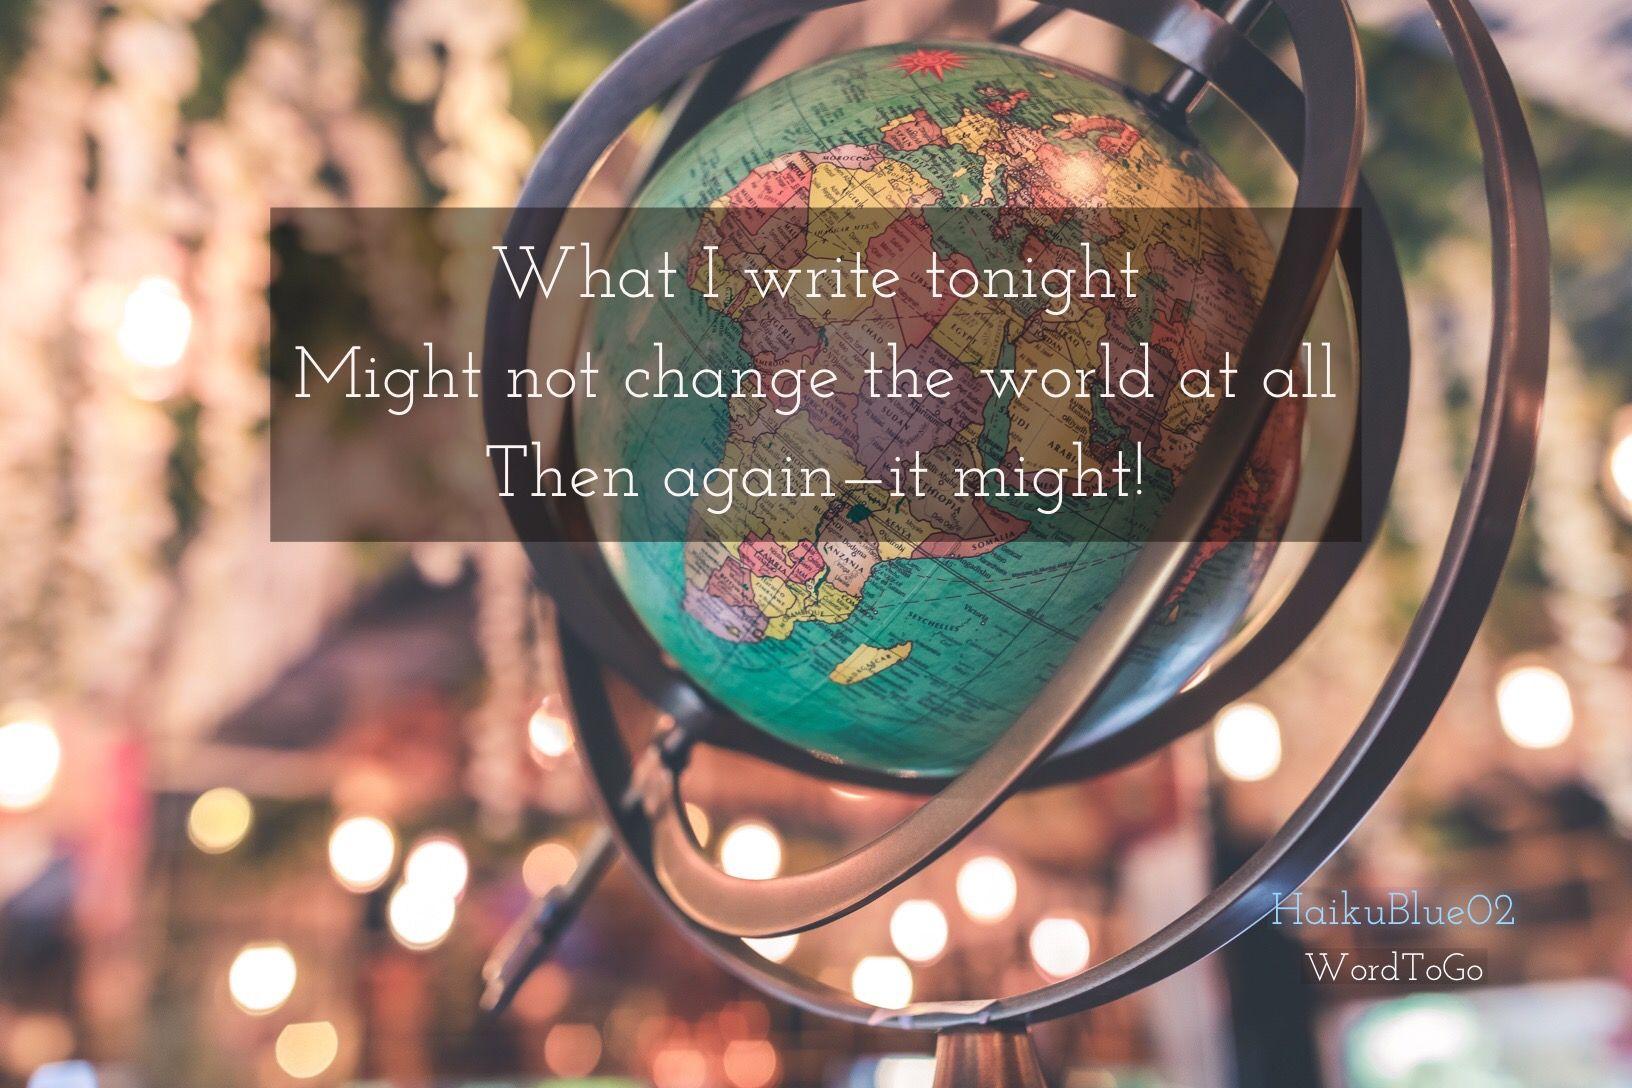 Pin by Stephen Mugglin on Life Thoughts Haiku Life